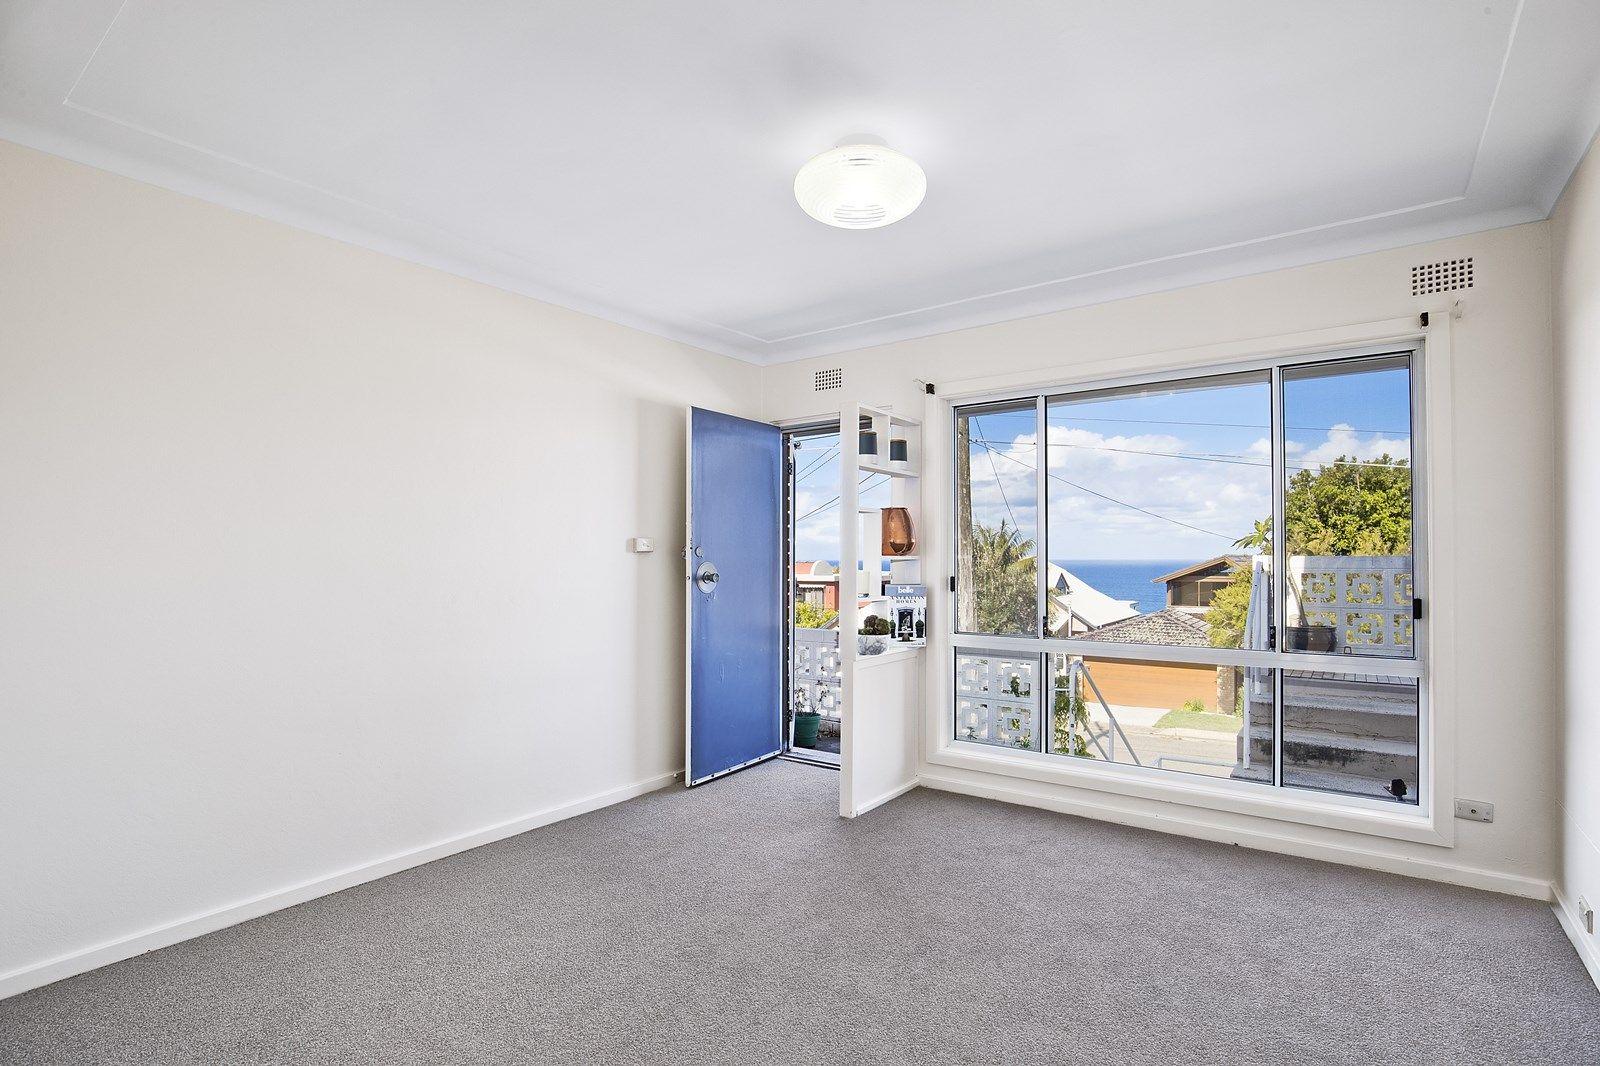 2/71 Hilma Street, Collaroy Plateau NSW 2097, Image 1